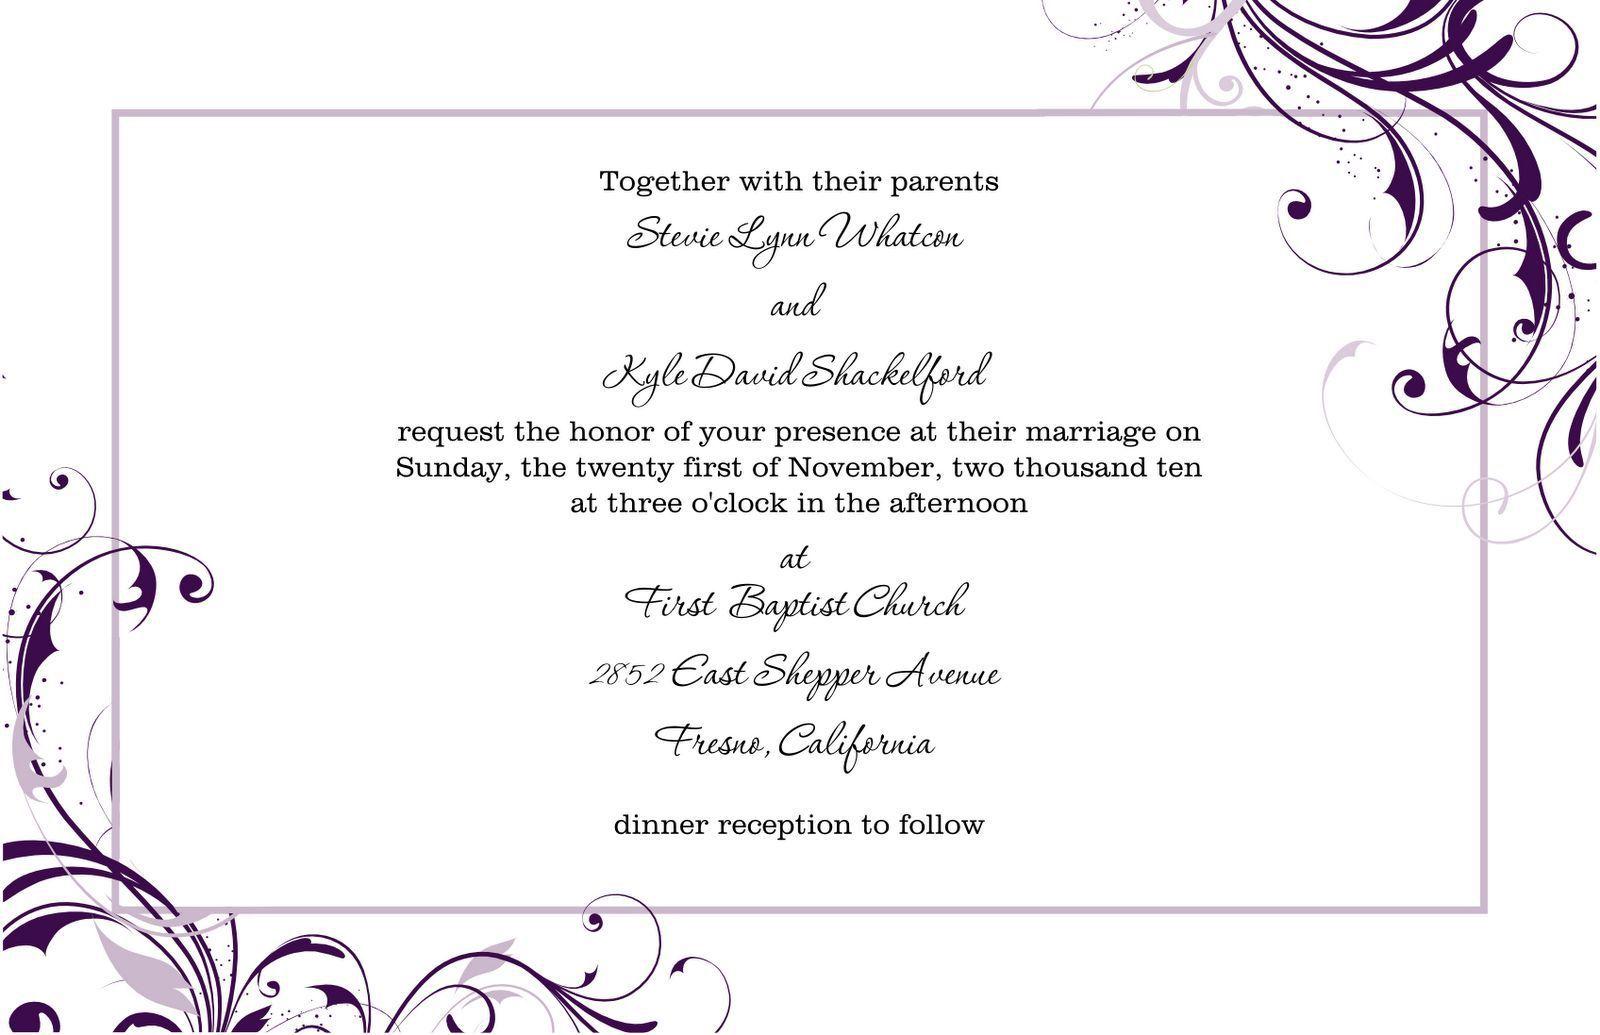 006 Singular Wedding Invitation Template Word High Resolution  Invite Wording Uk Anniversary Microsoft Free MarriageFull